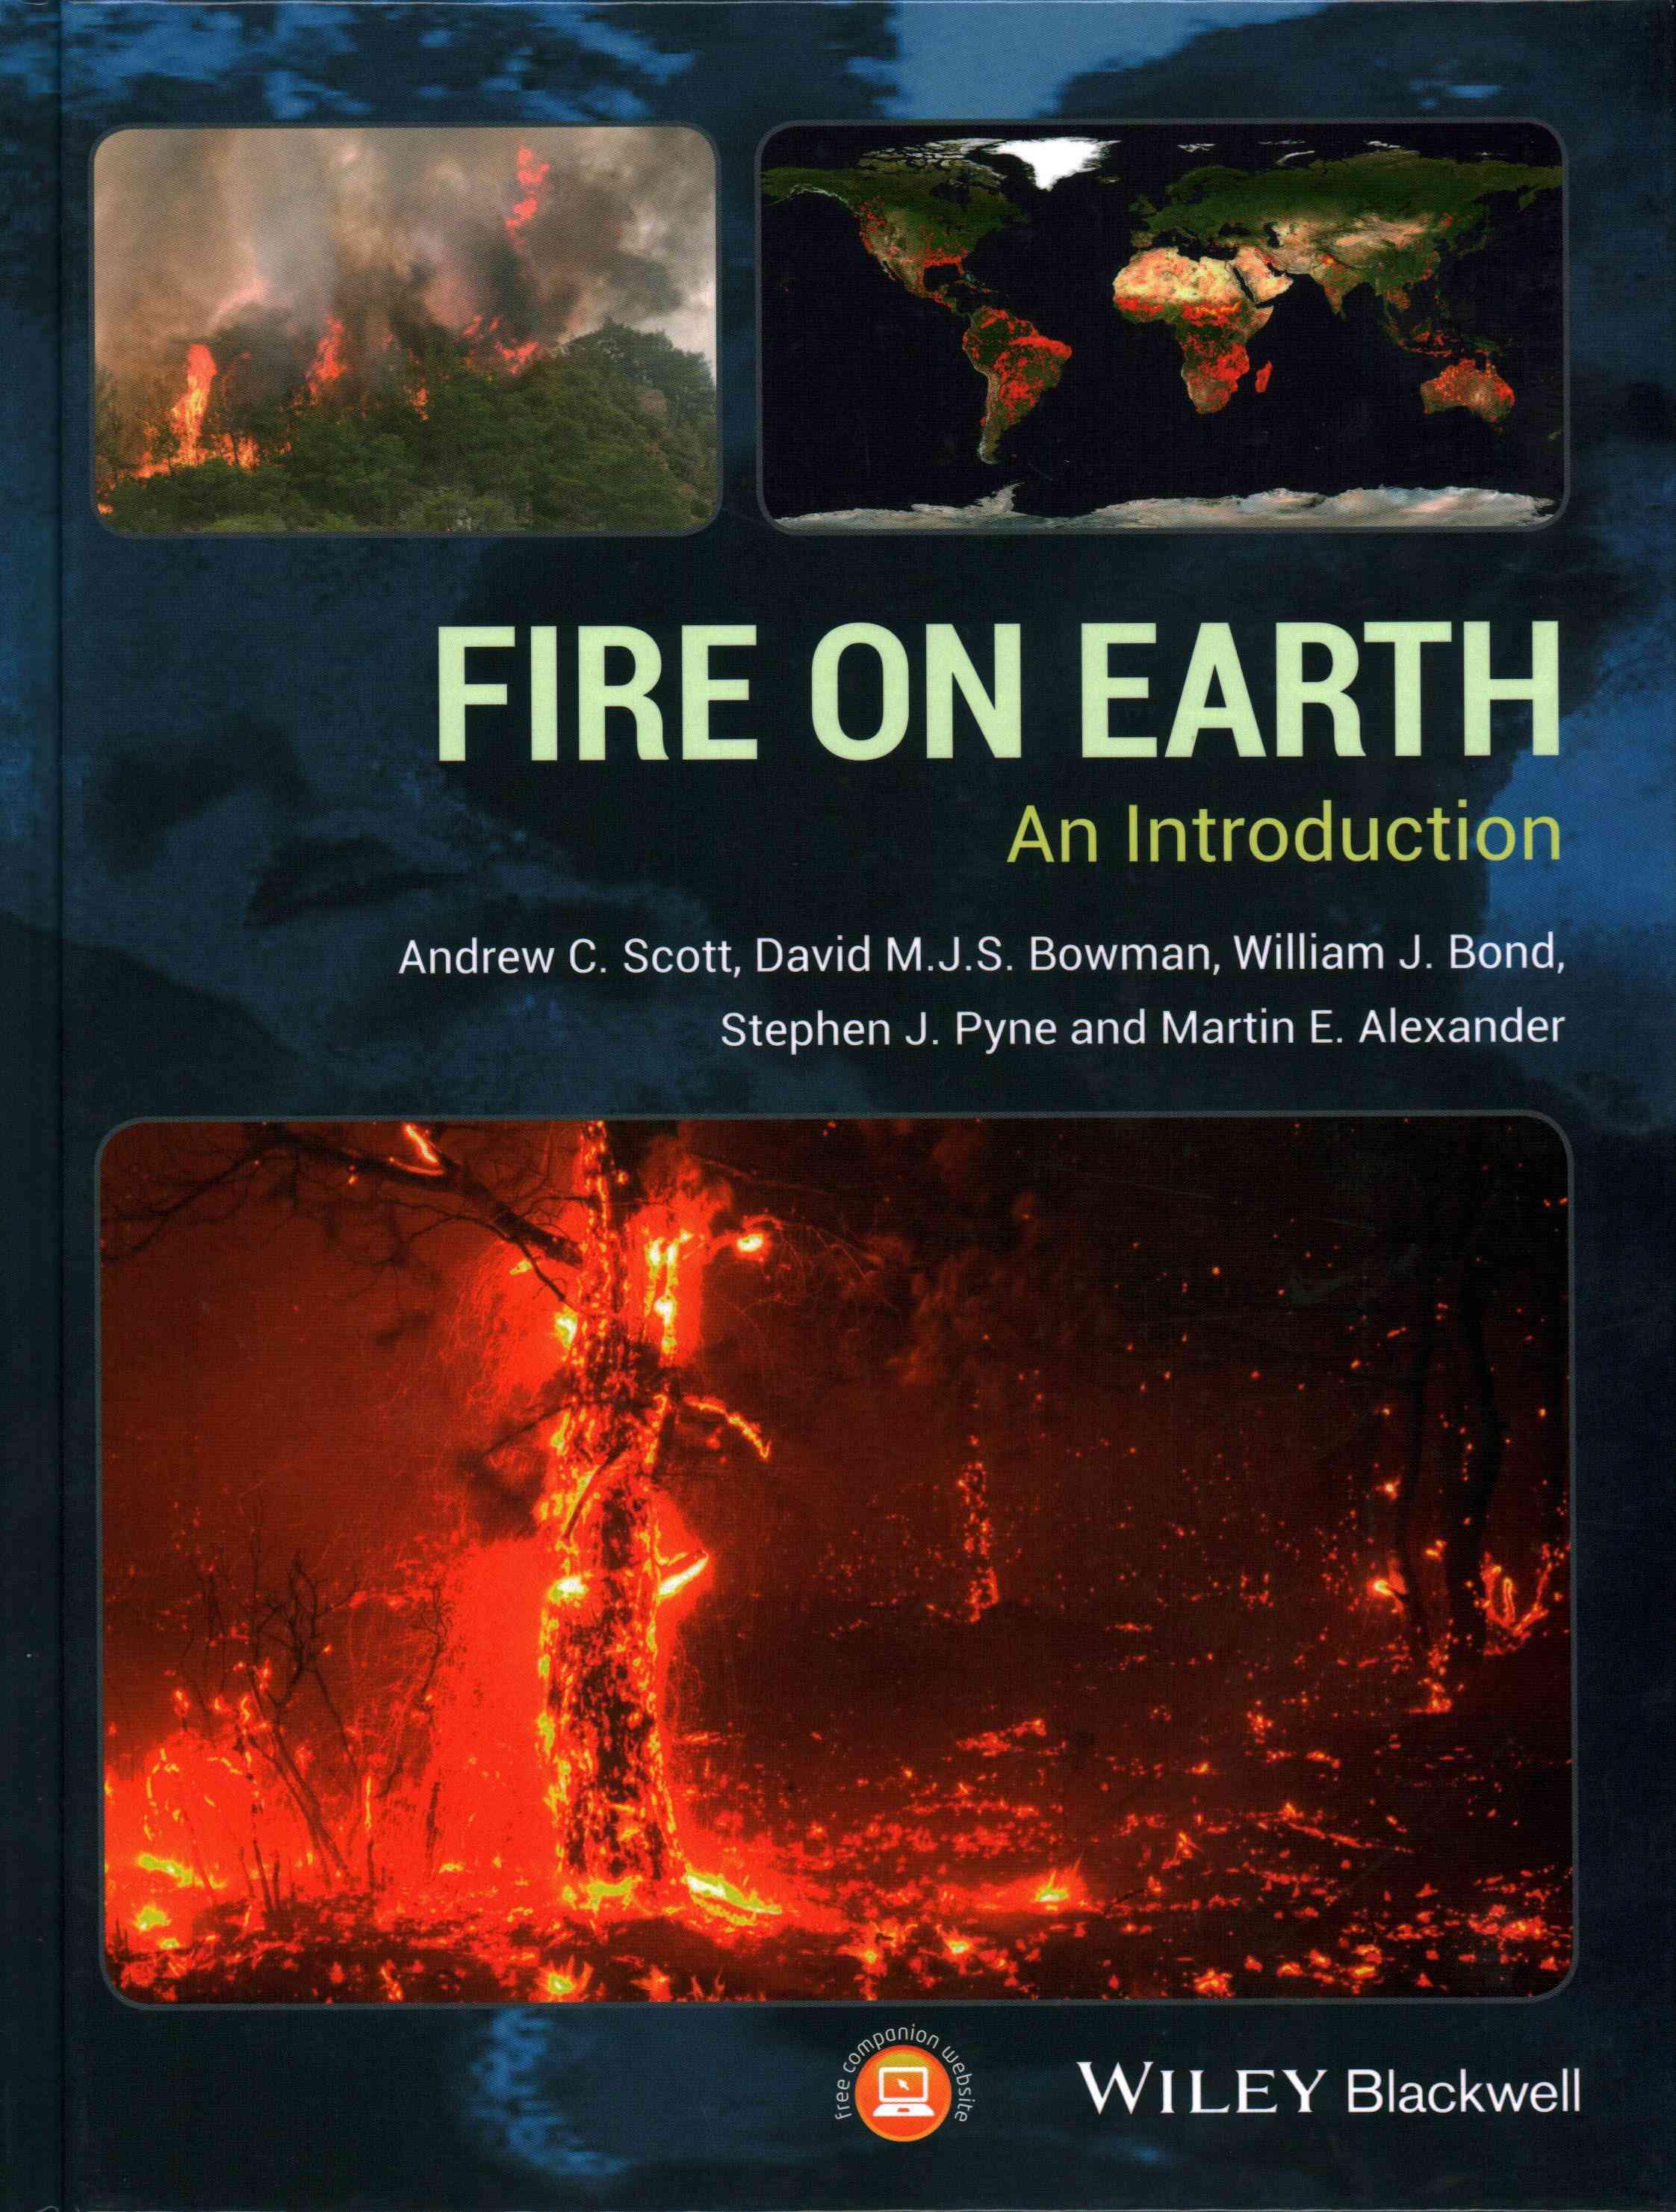 Fire on Earth By Scott, Andrew C./ Bowman, David M. J. S./ Bond, William J./ Pyne, Stephen J./ Alexander, Martin E.